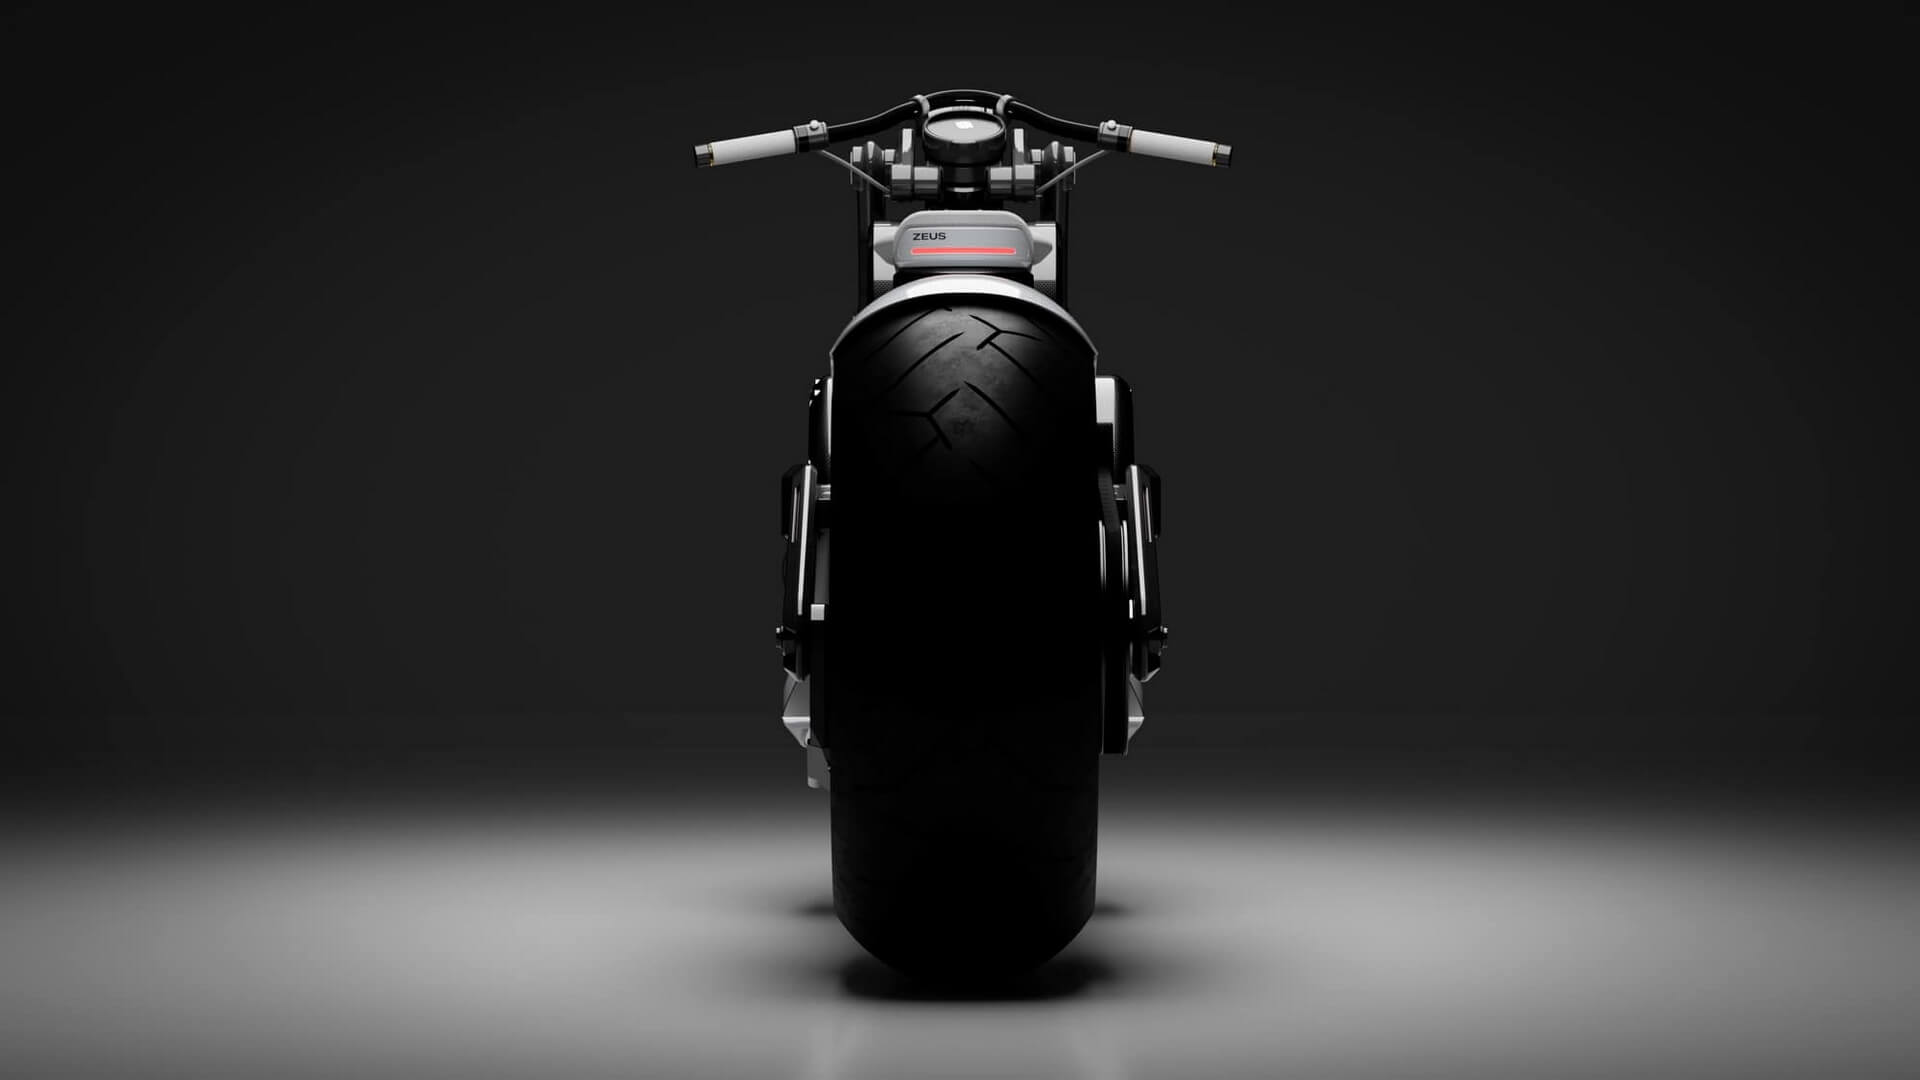 Электрический мотоцикл Zeus Cafe - вид сзади